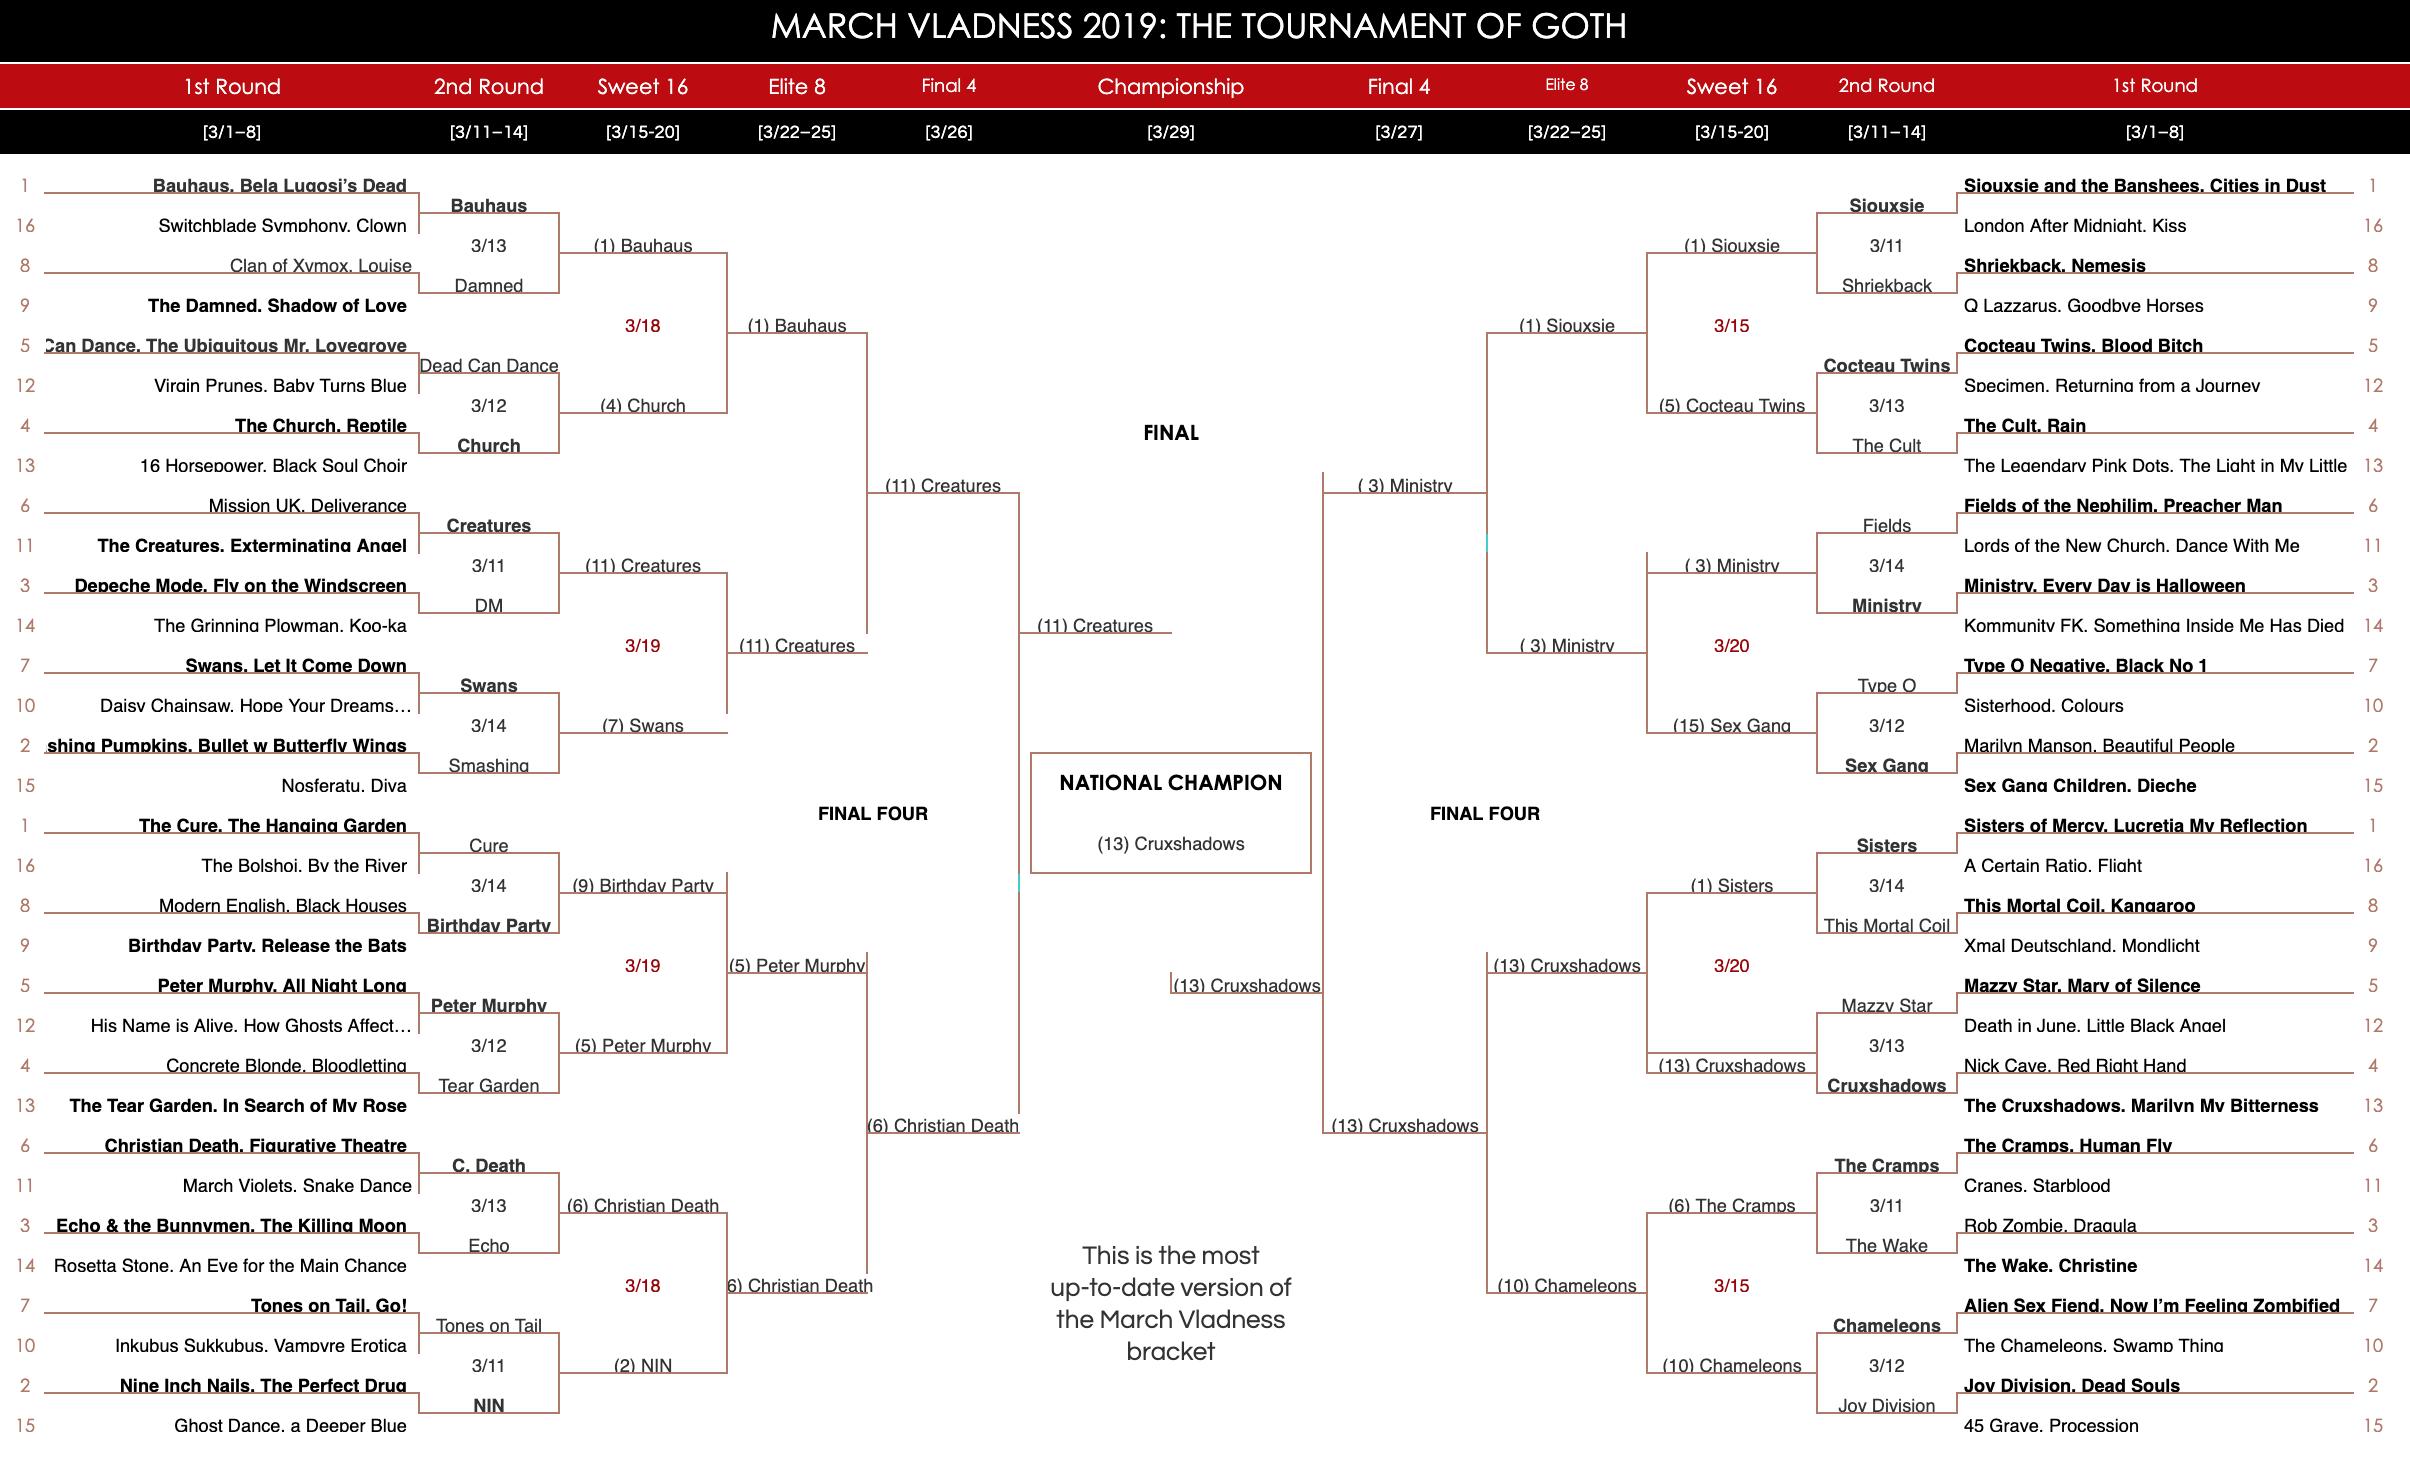 vladness_final_bracket.png